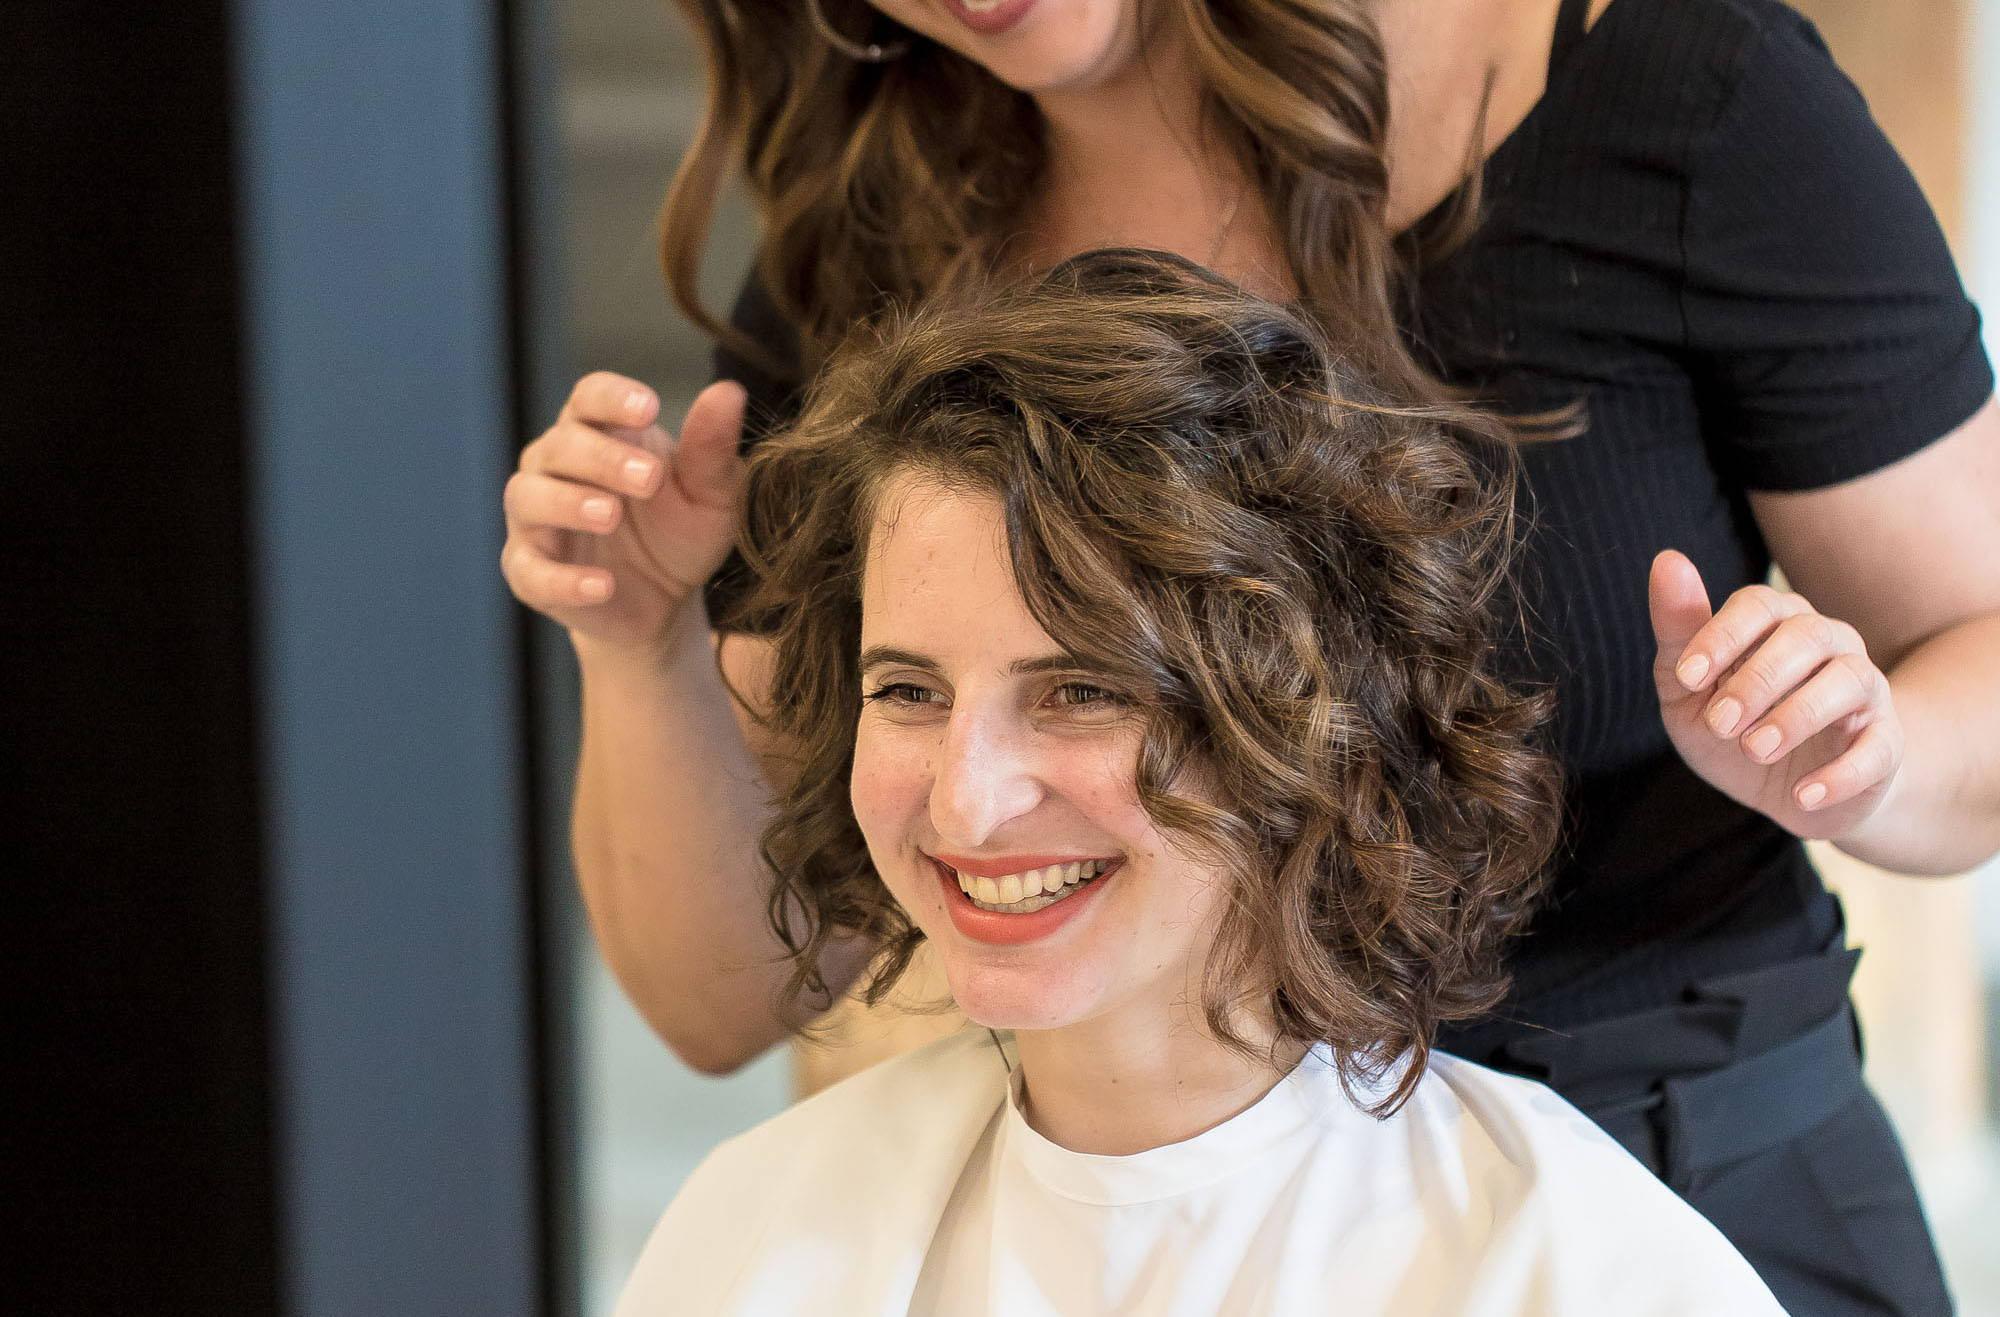 How to style permed hair Davines Rob peetoom salon